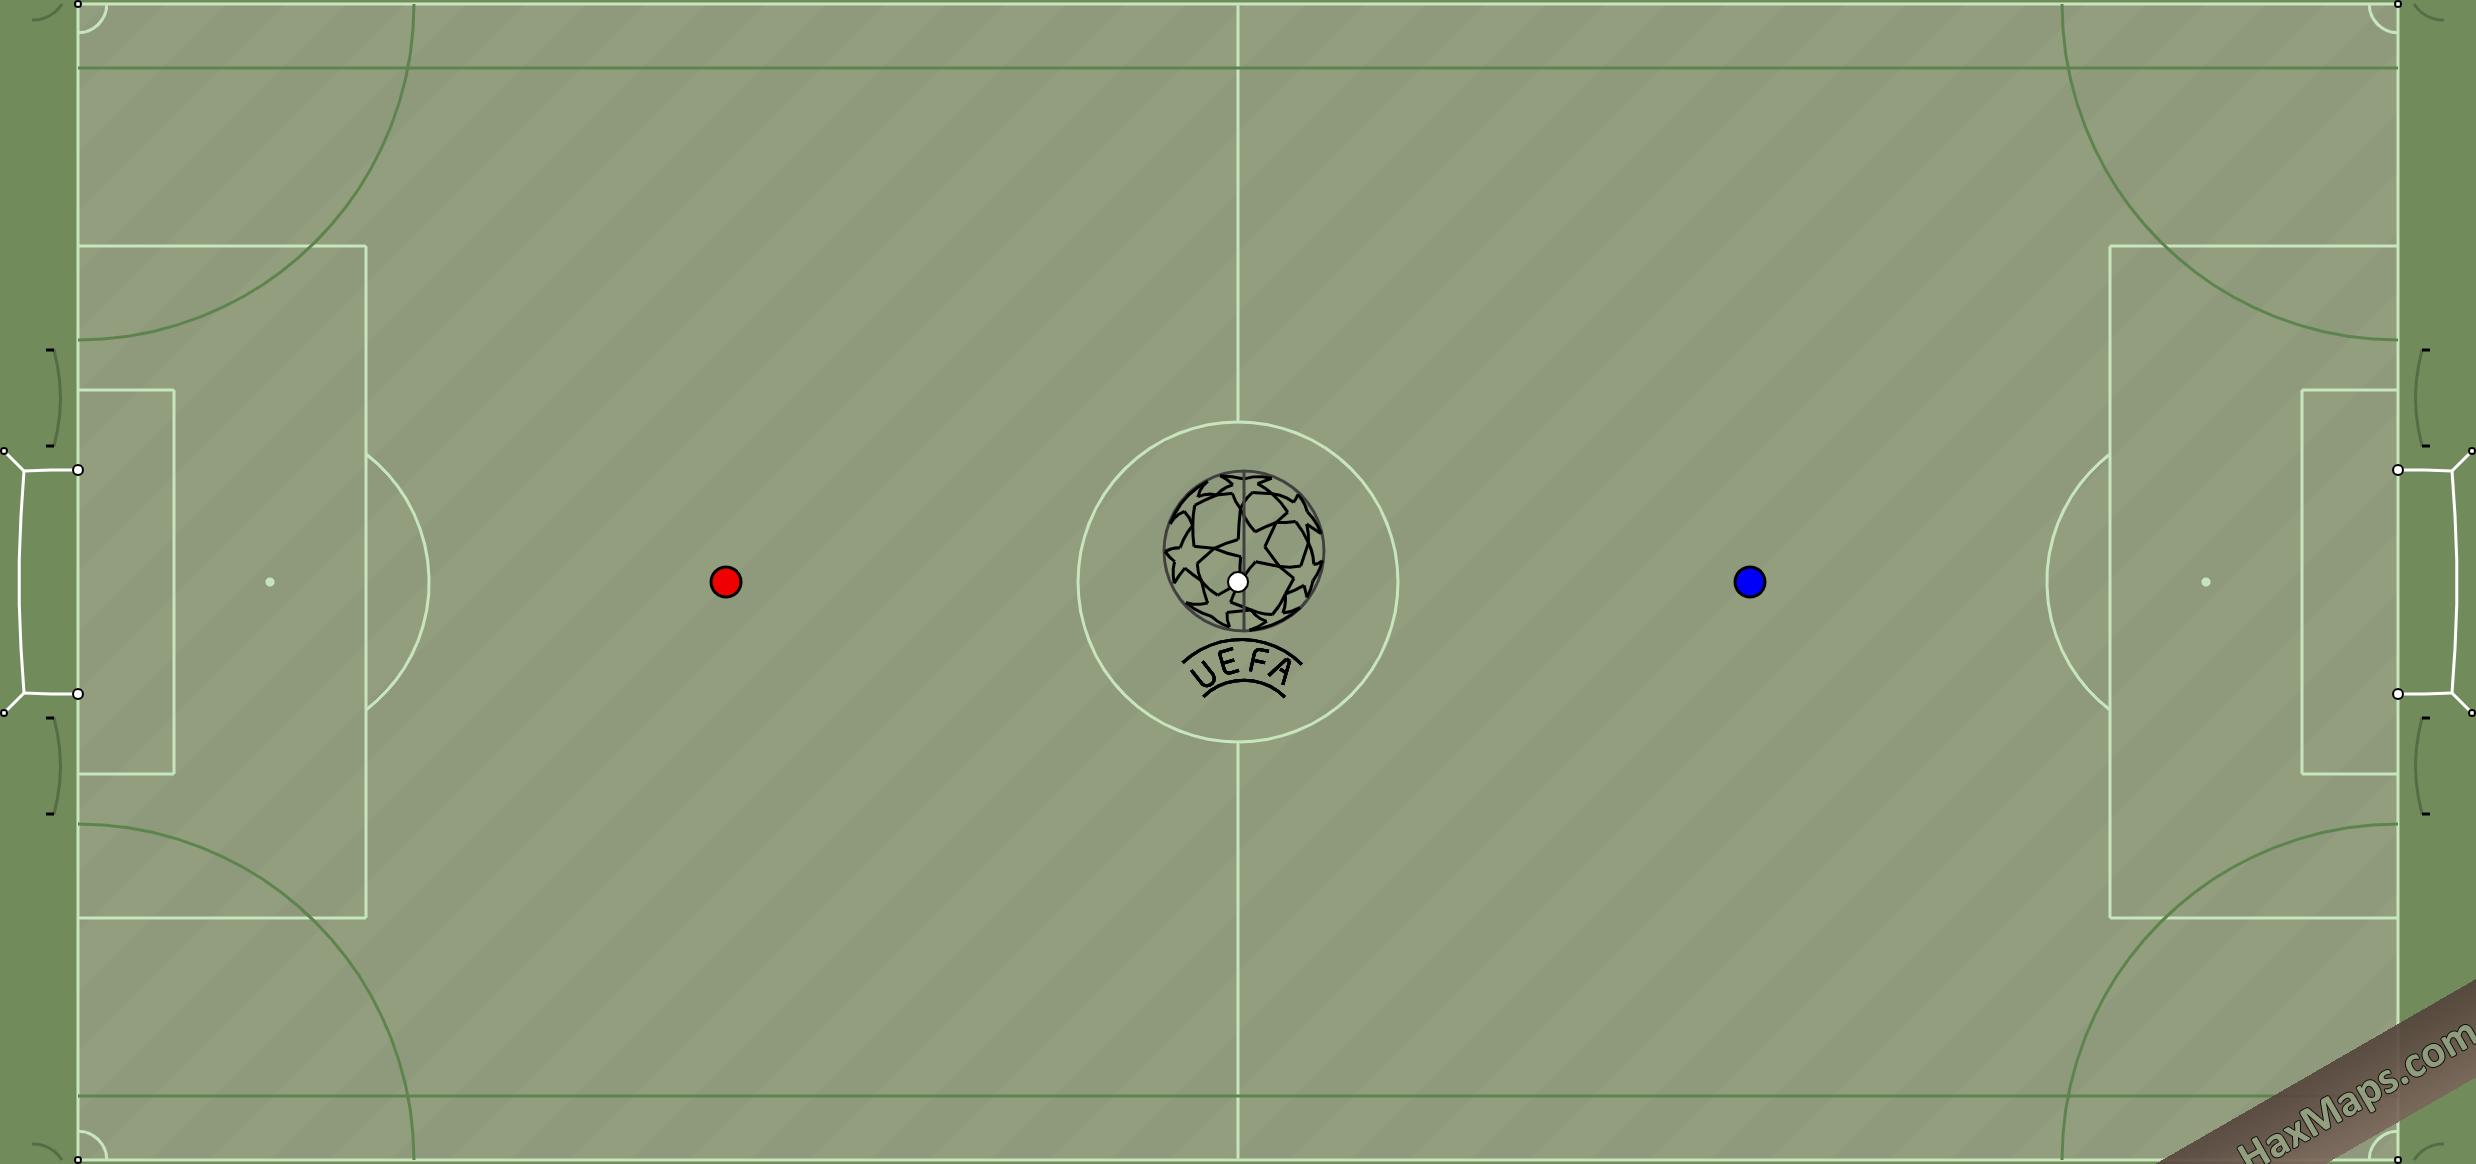 hax ball maps   Real soccer v4 Champions League by Tatangugu